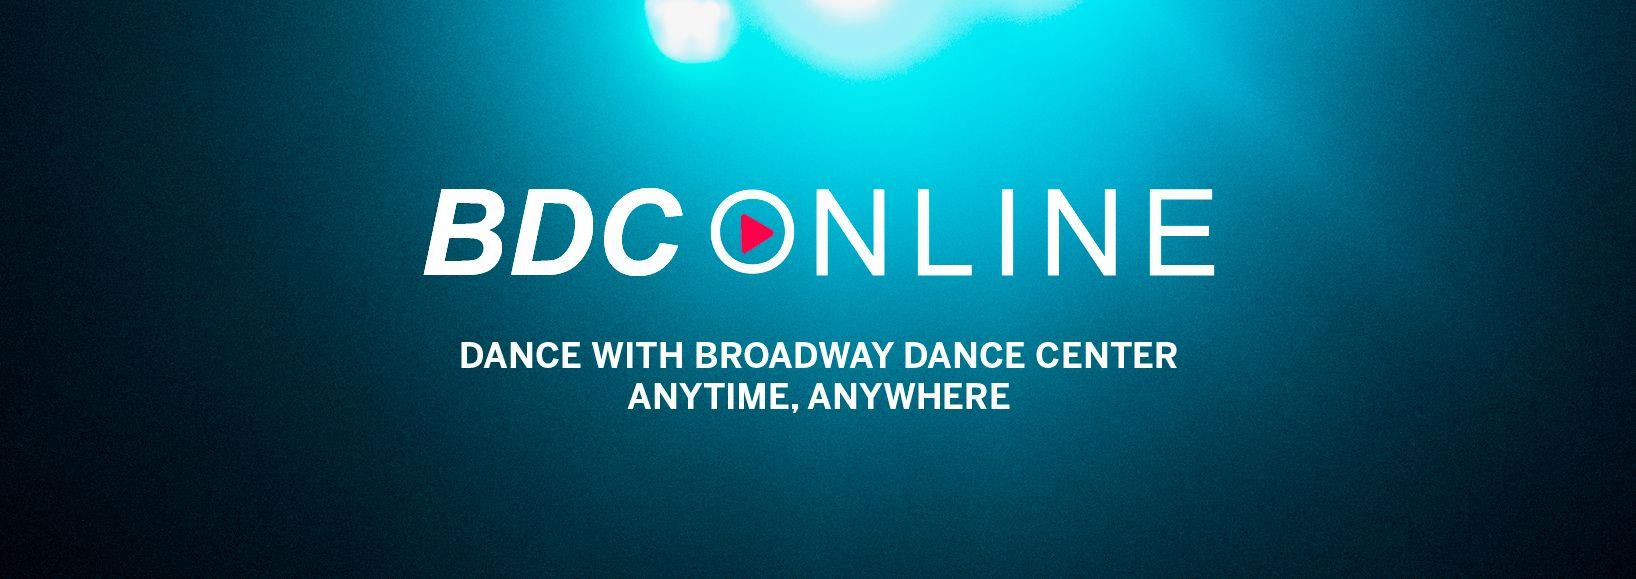 BDC Online